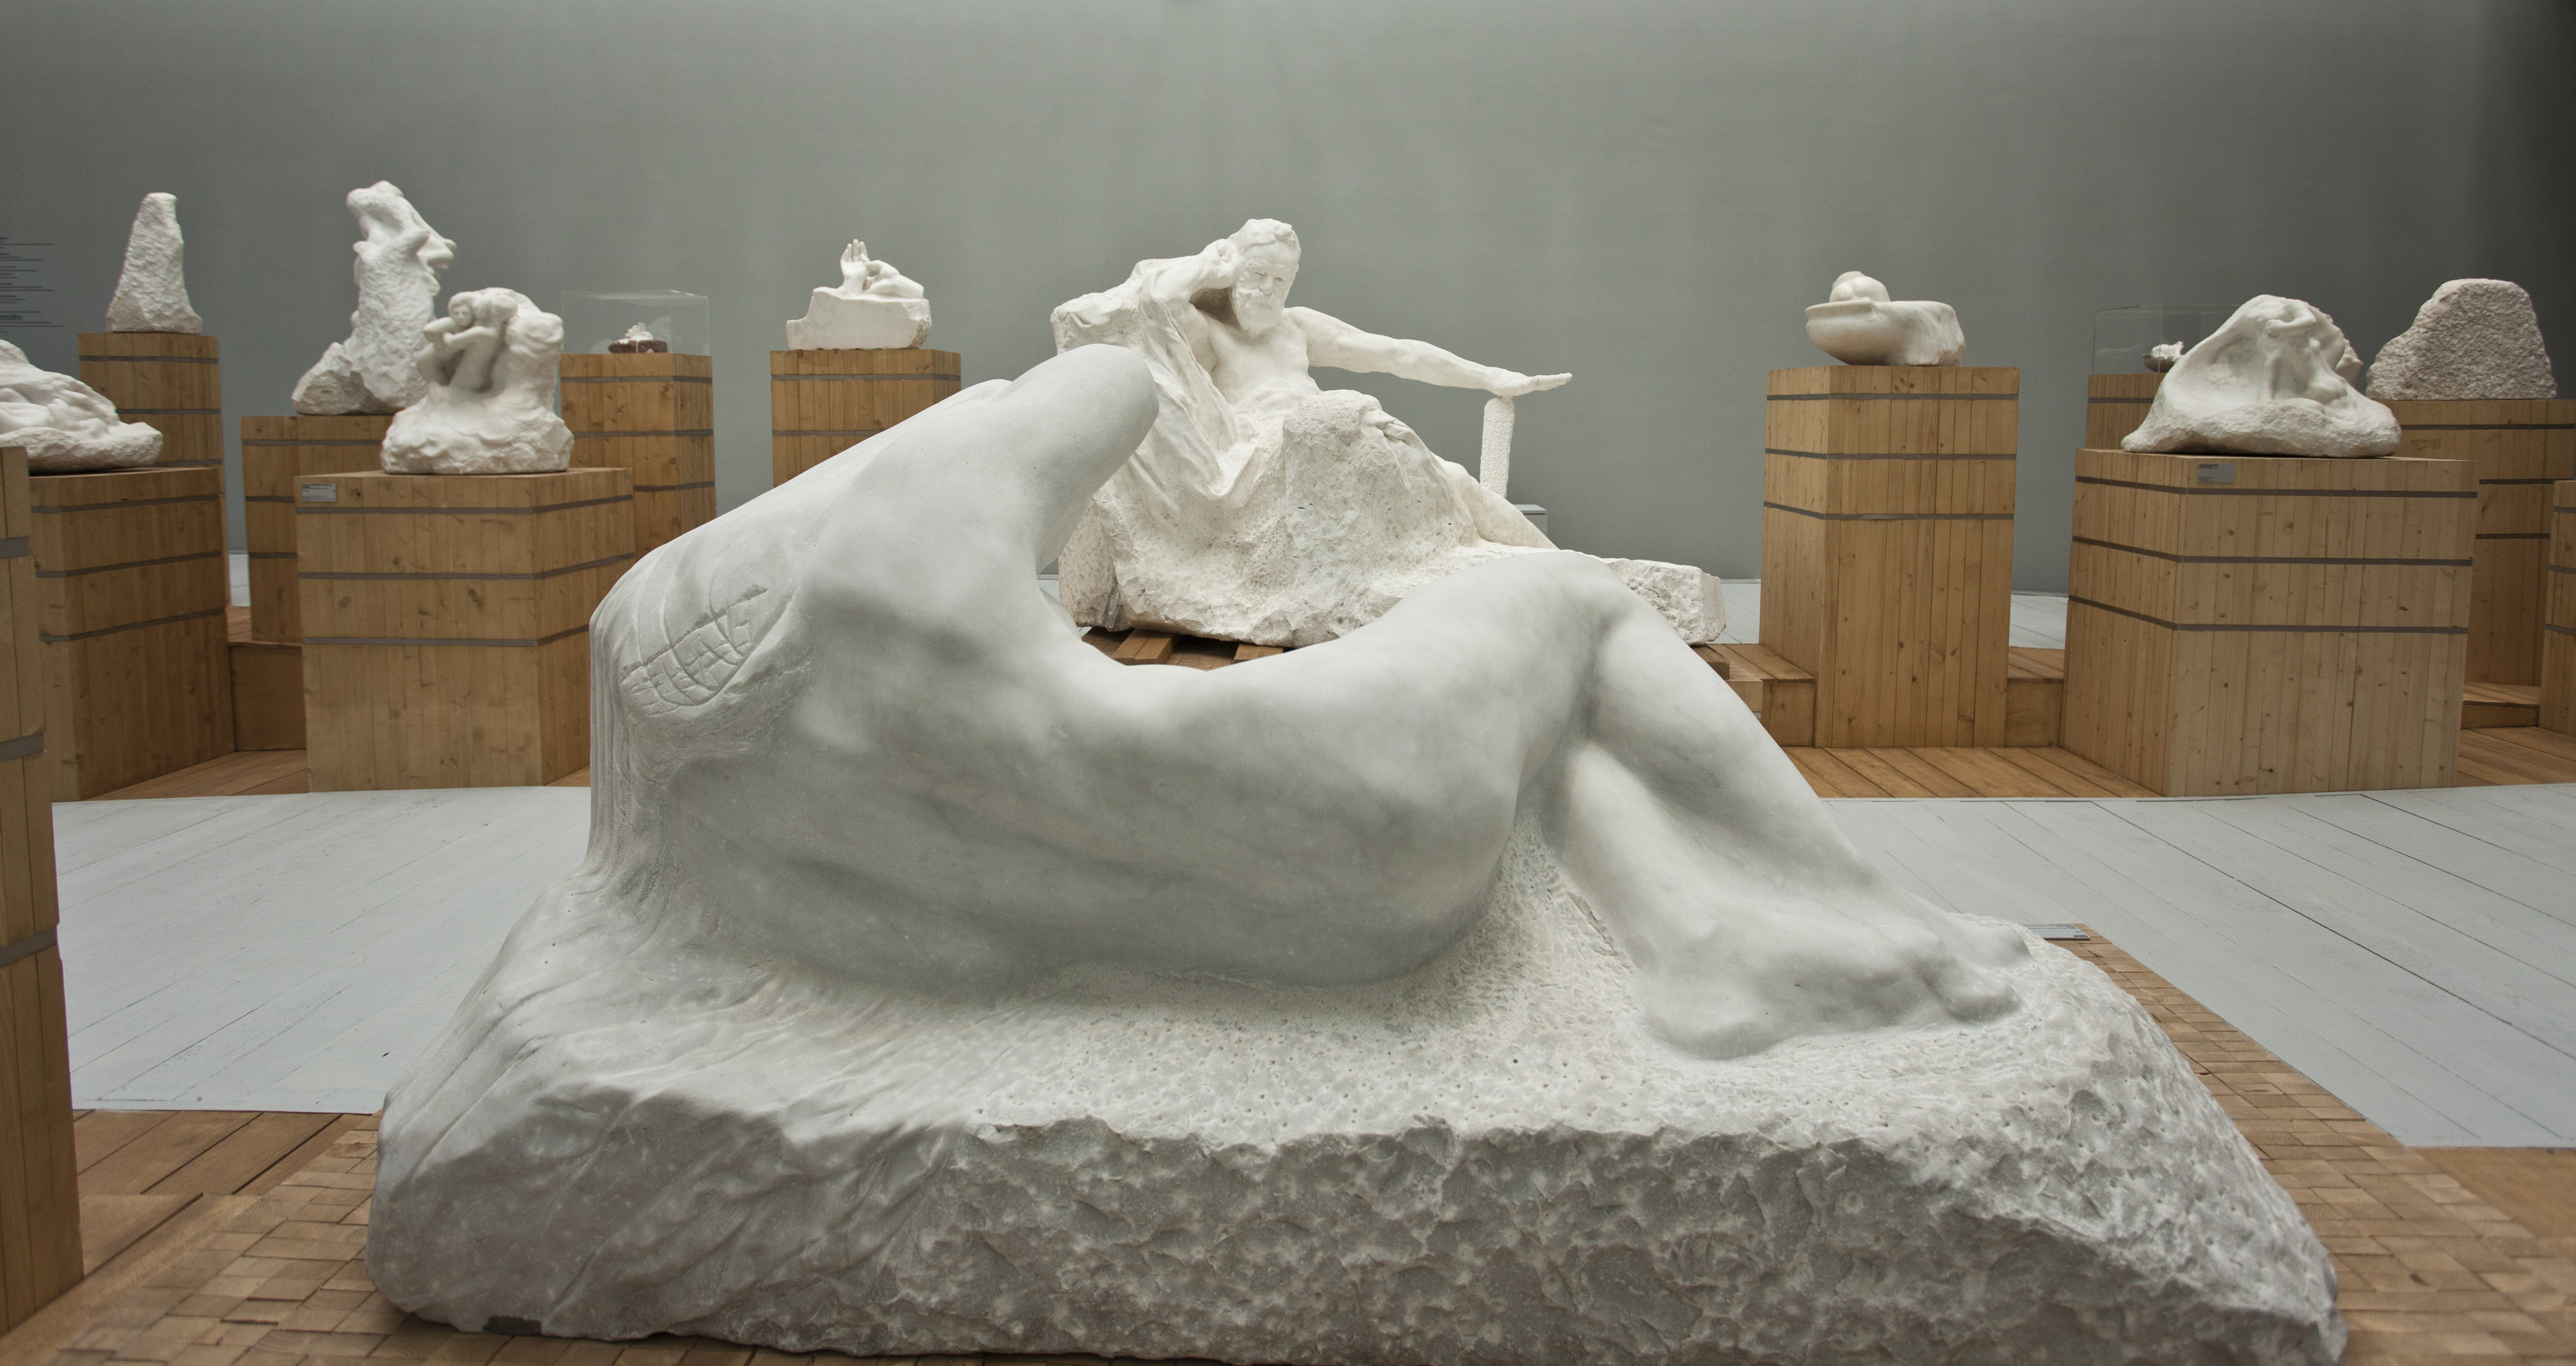 Chez Rodin avec Claudel E90ed6759c35e85172f1bce8b138d1b6ef36bdff